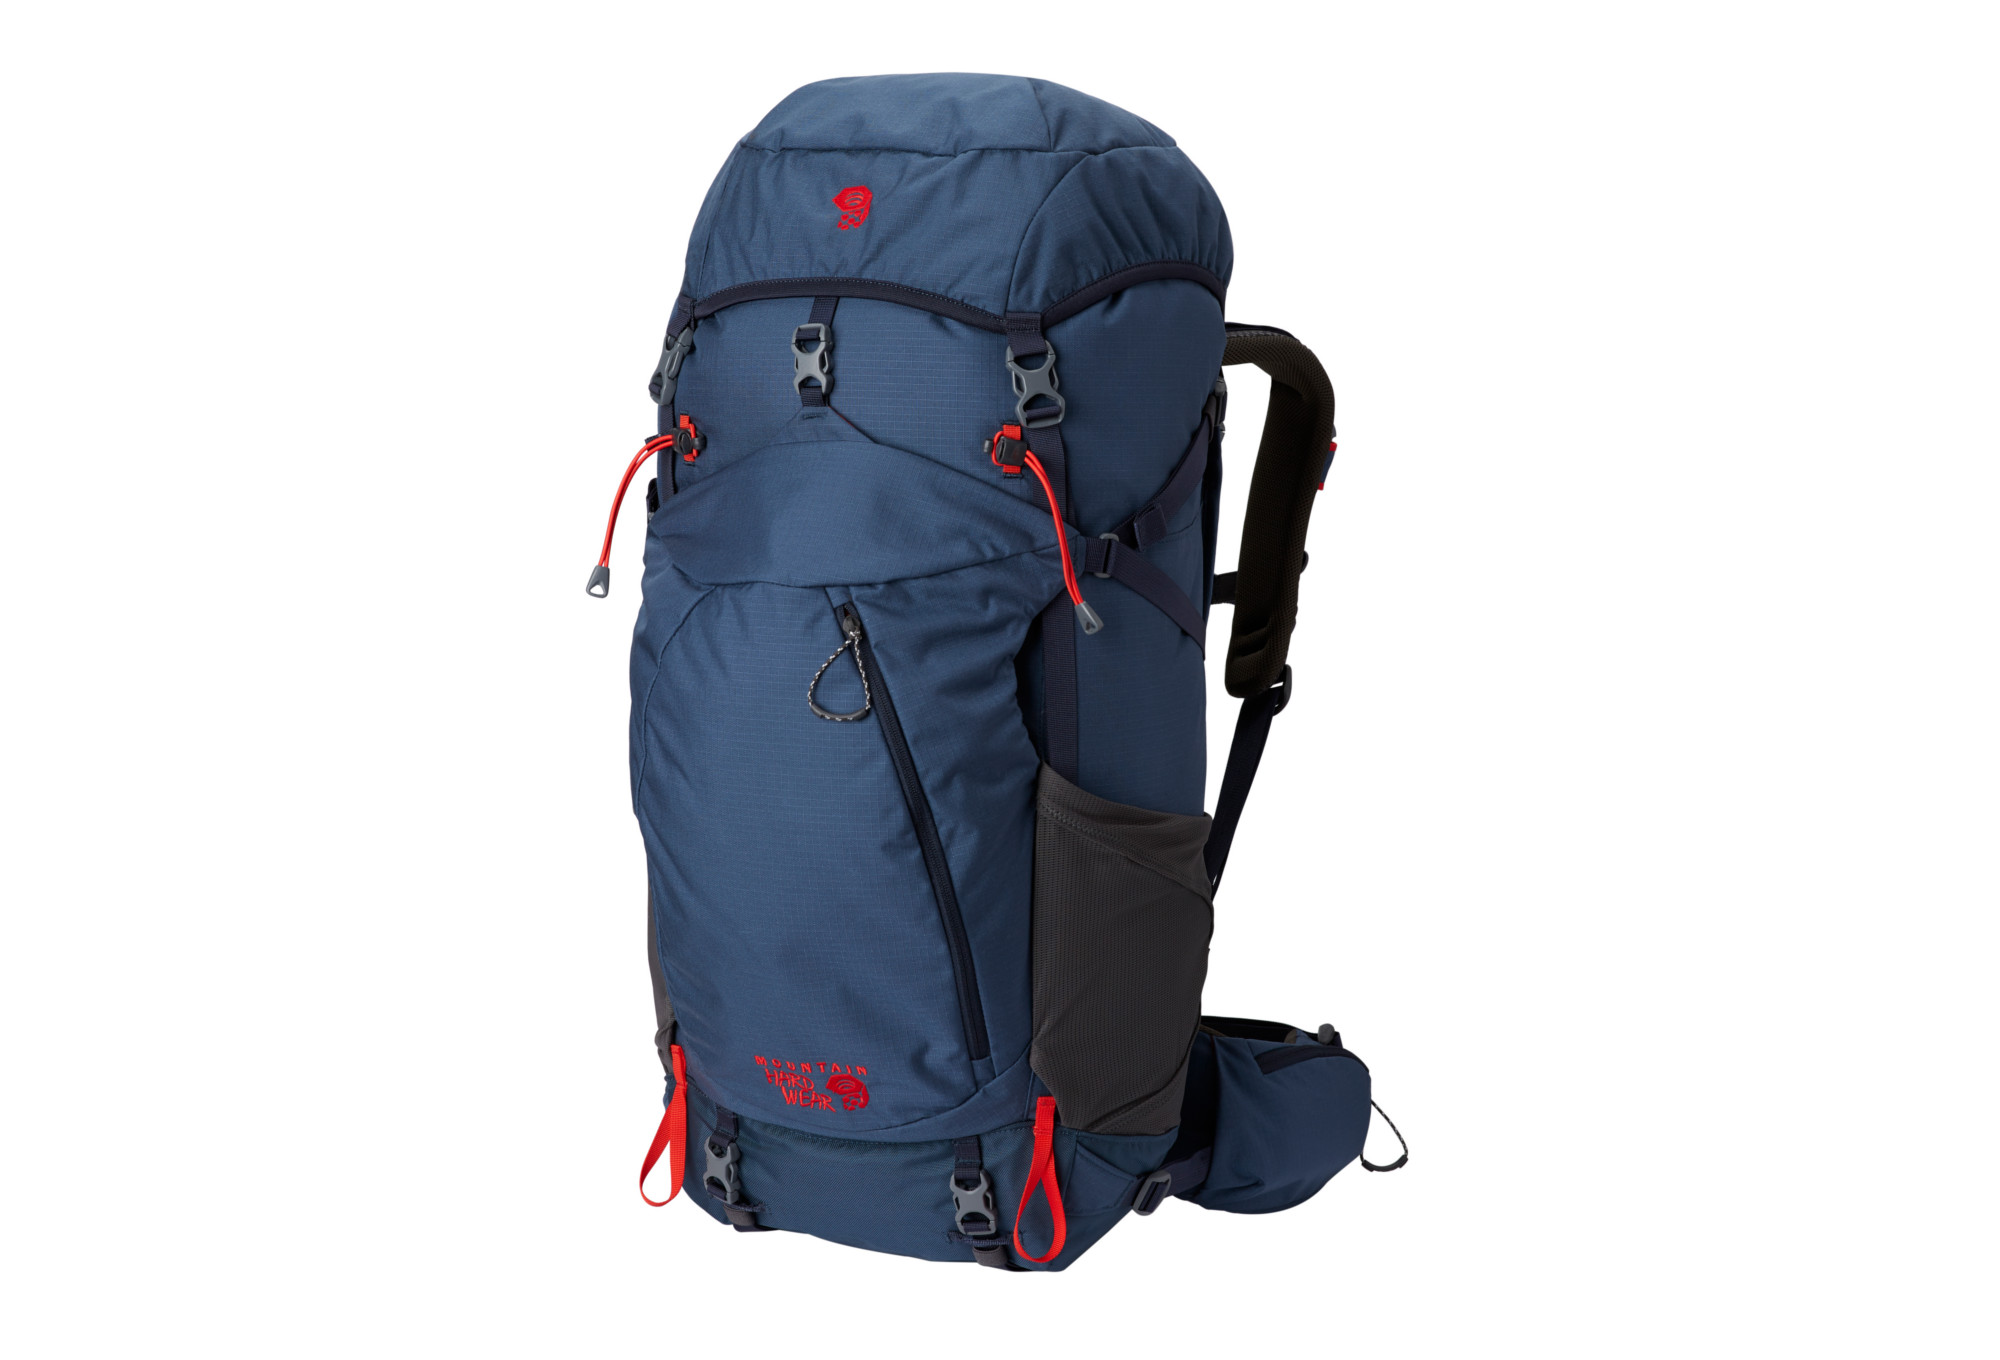 4983e0efda688 Mountain Hardwear Ozonic 60 OutDry Damen Rucksack Blau